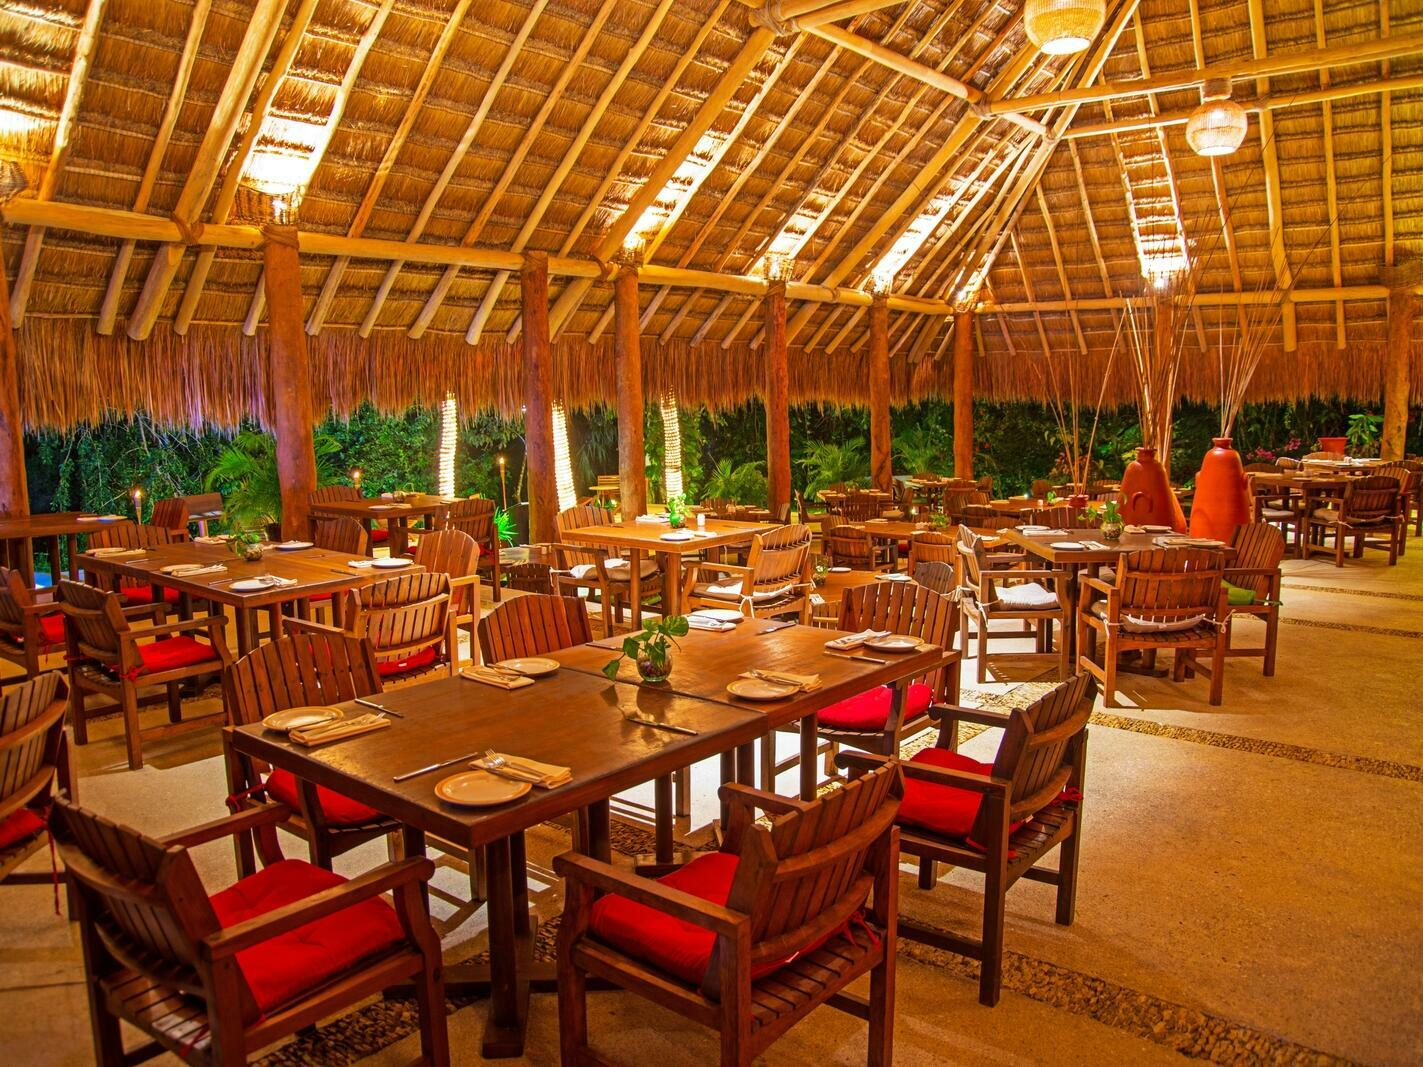 Restaurant dining area at La Coleccion Resorts